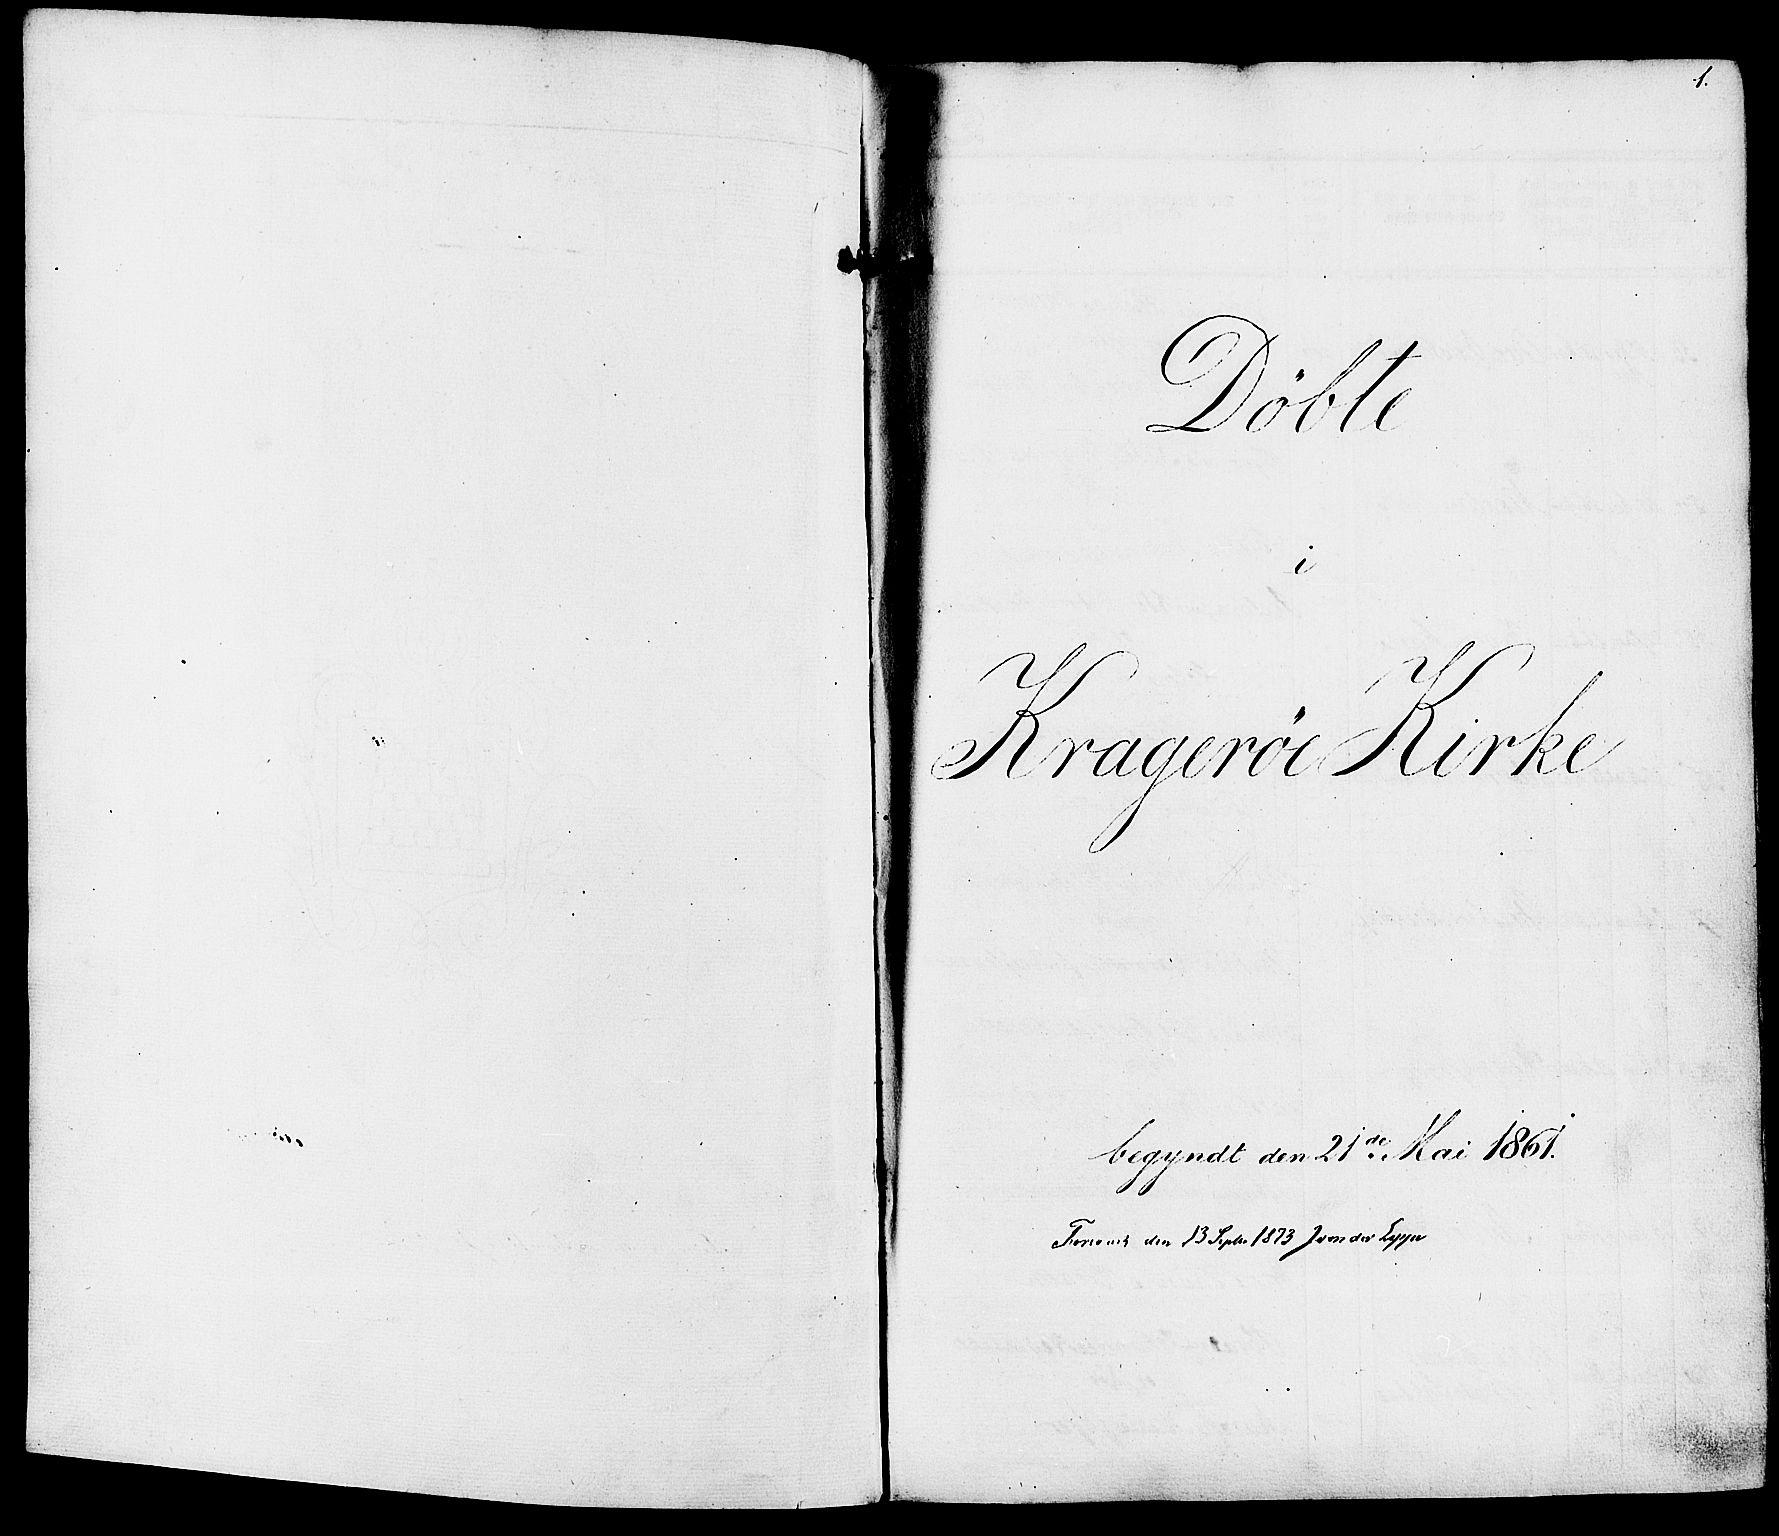 SAKO, Kragerø kirkebøker, F/Fa/L0007: Ministerialbok nr. 7, 1861-1875, s. 1